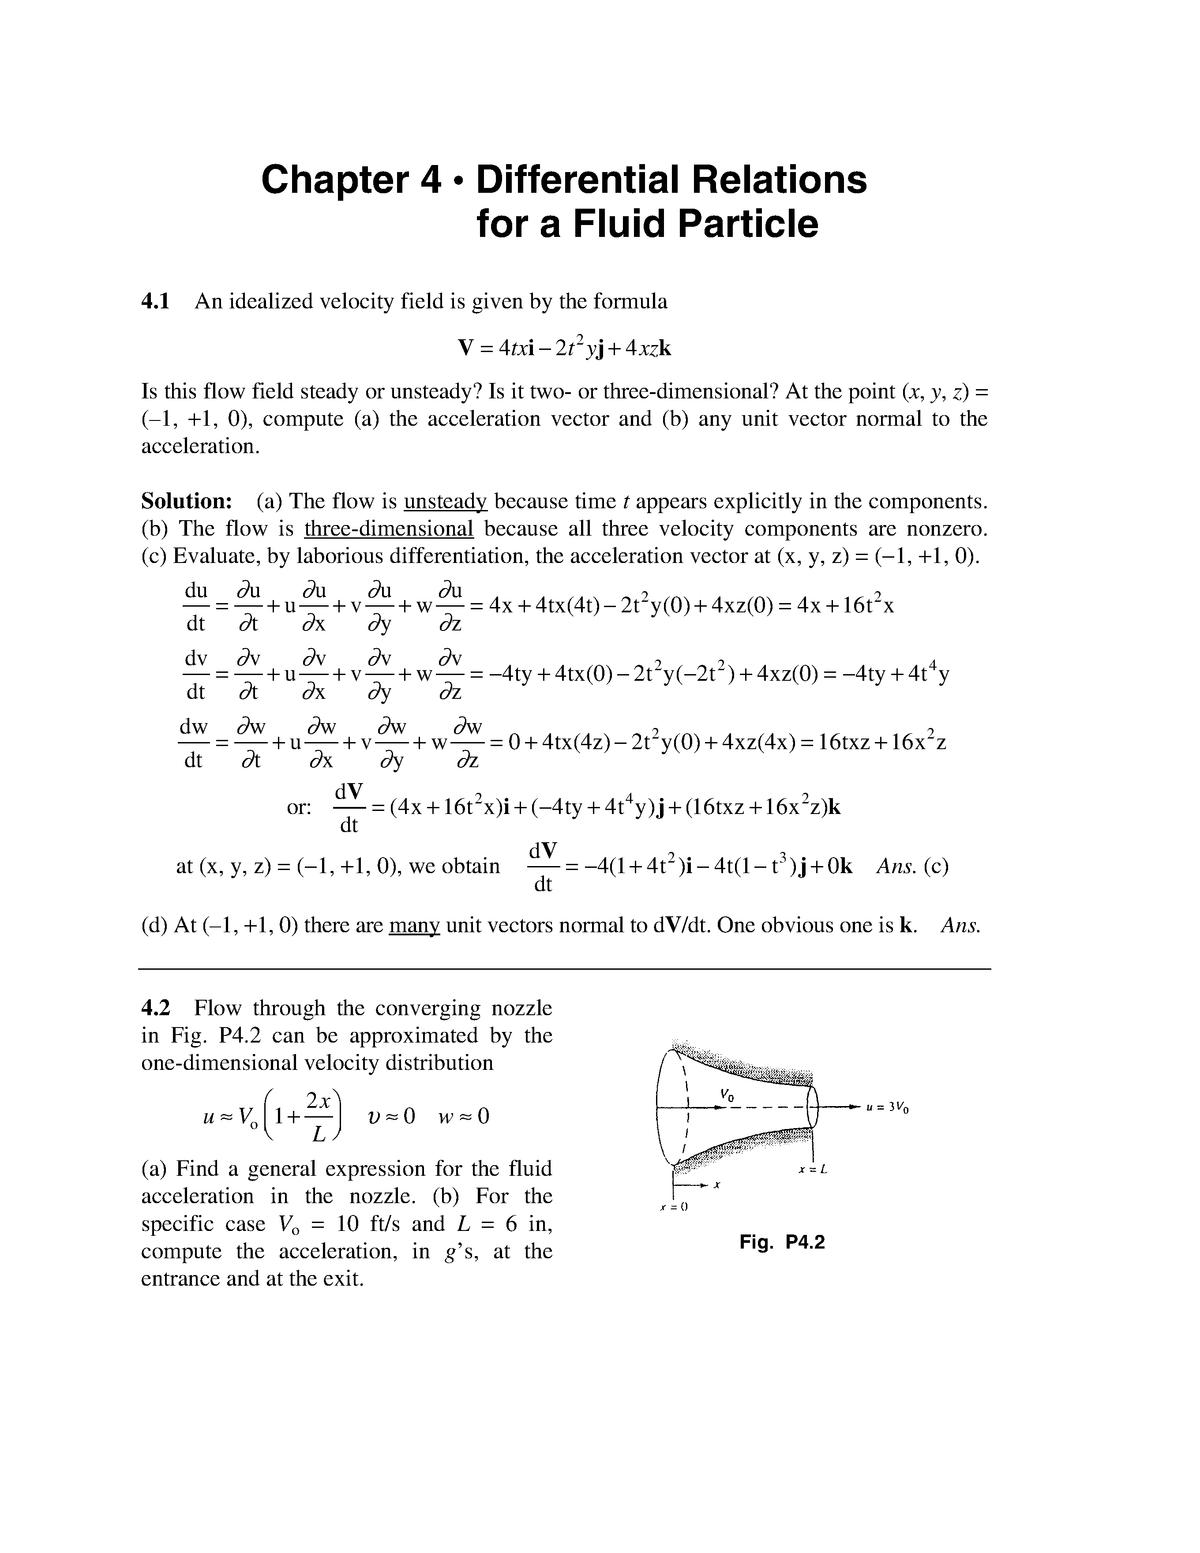 Solution Manual Fluid Mechanics White 5th CH 4 - WB2542 T1 S